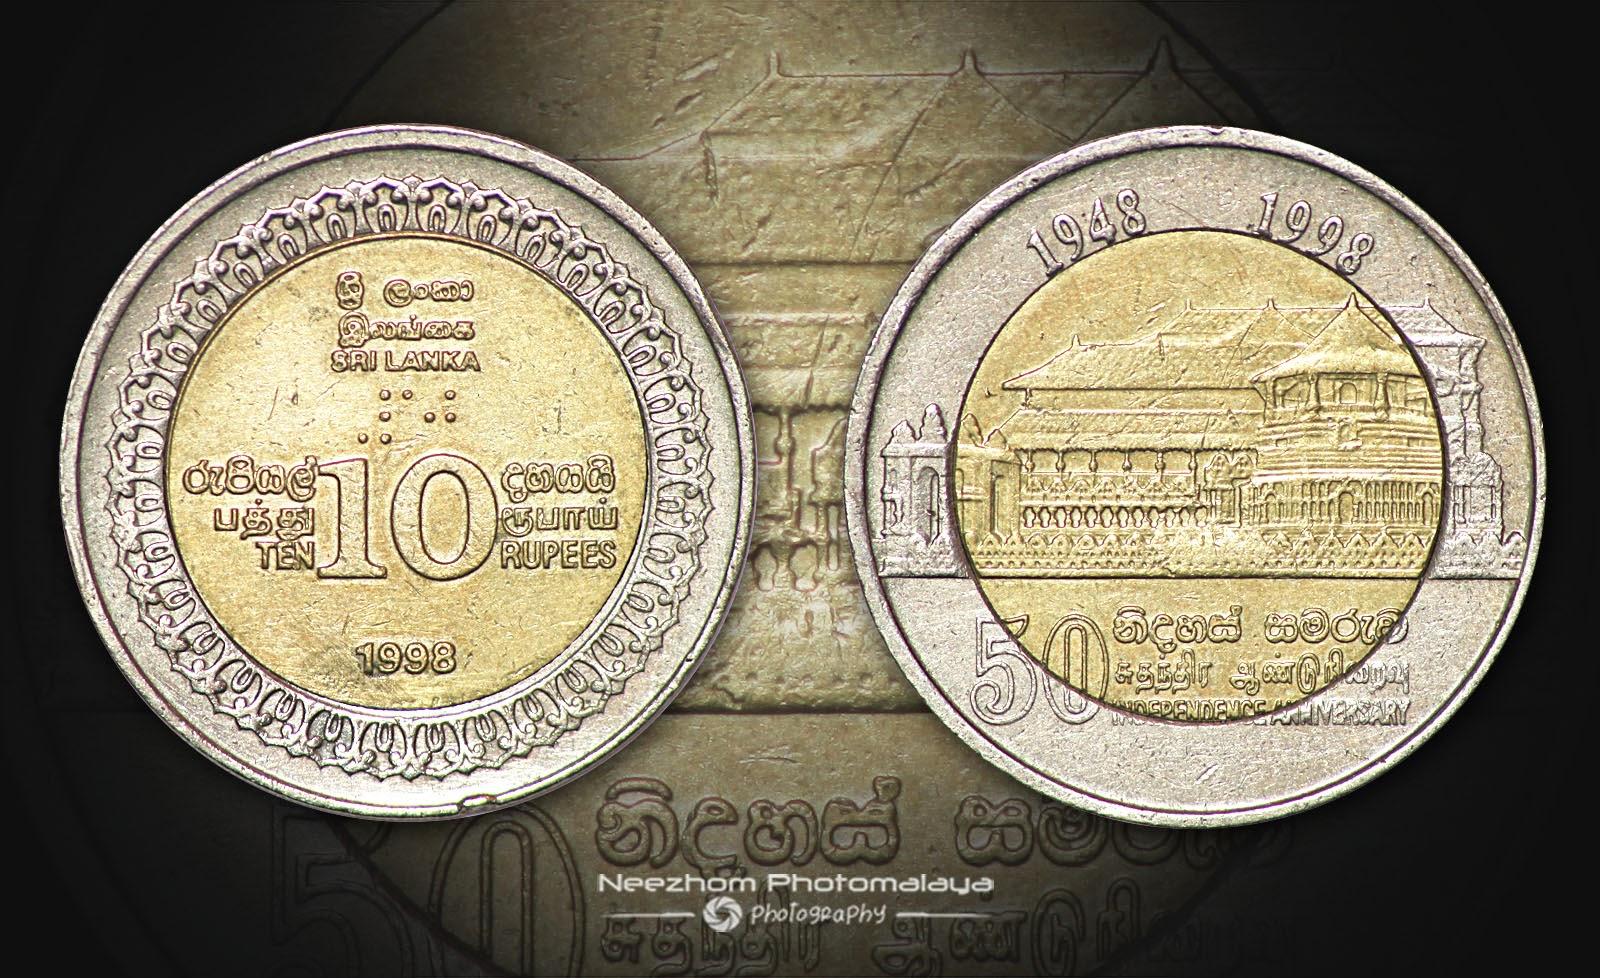 Sri Lanka 10 Rupees 1998 50th Independence Anniversary